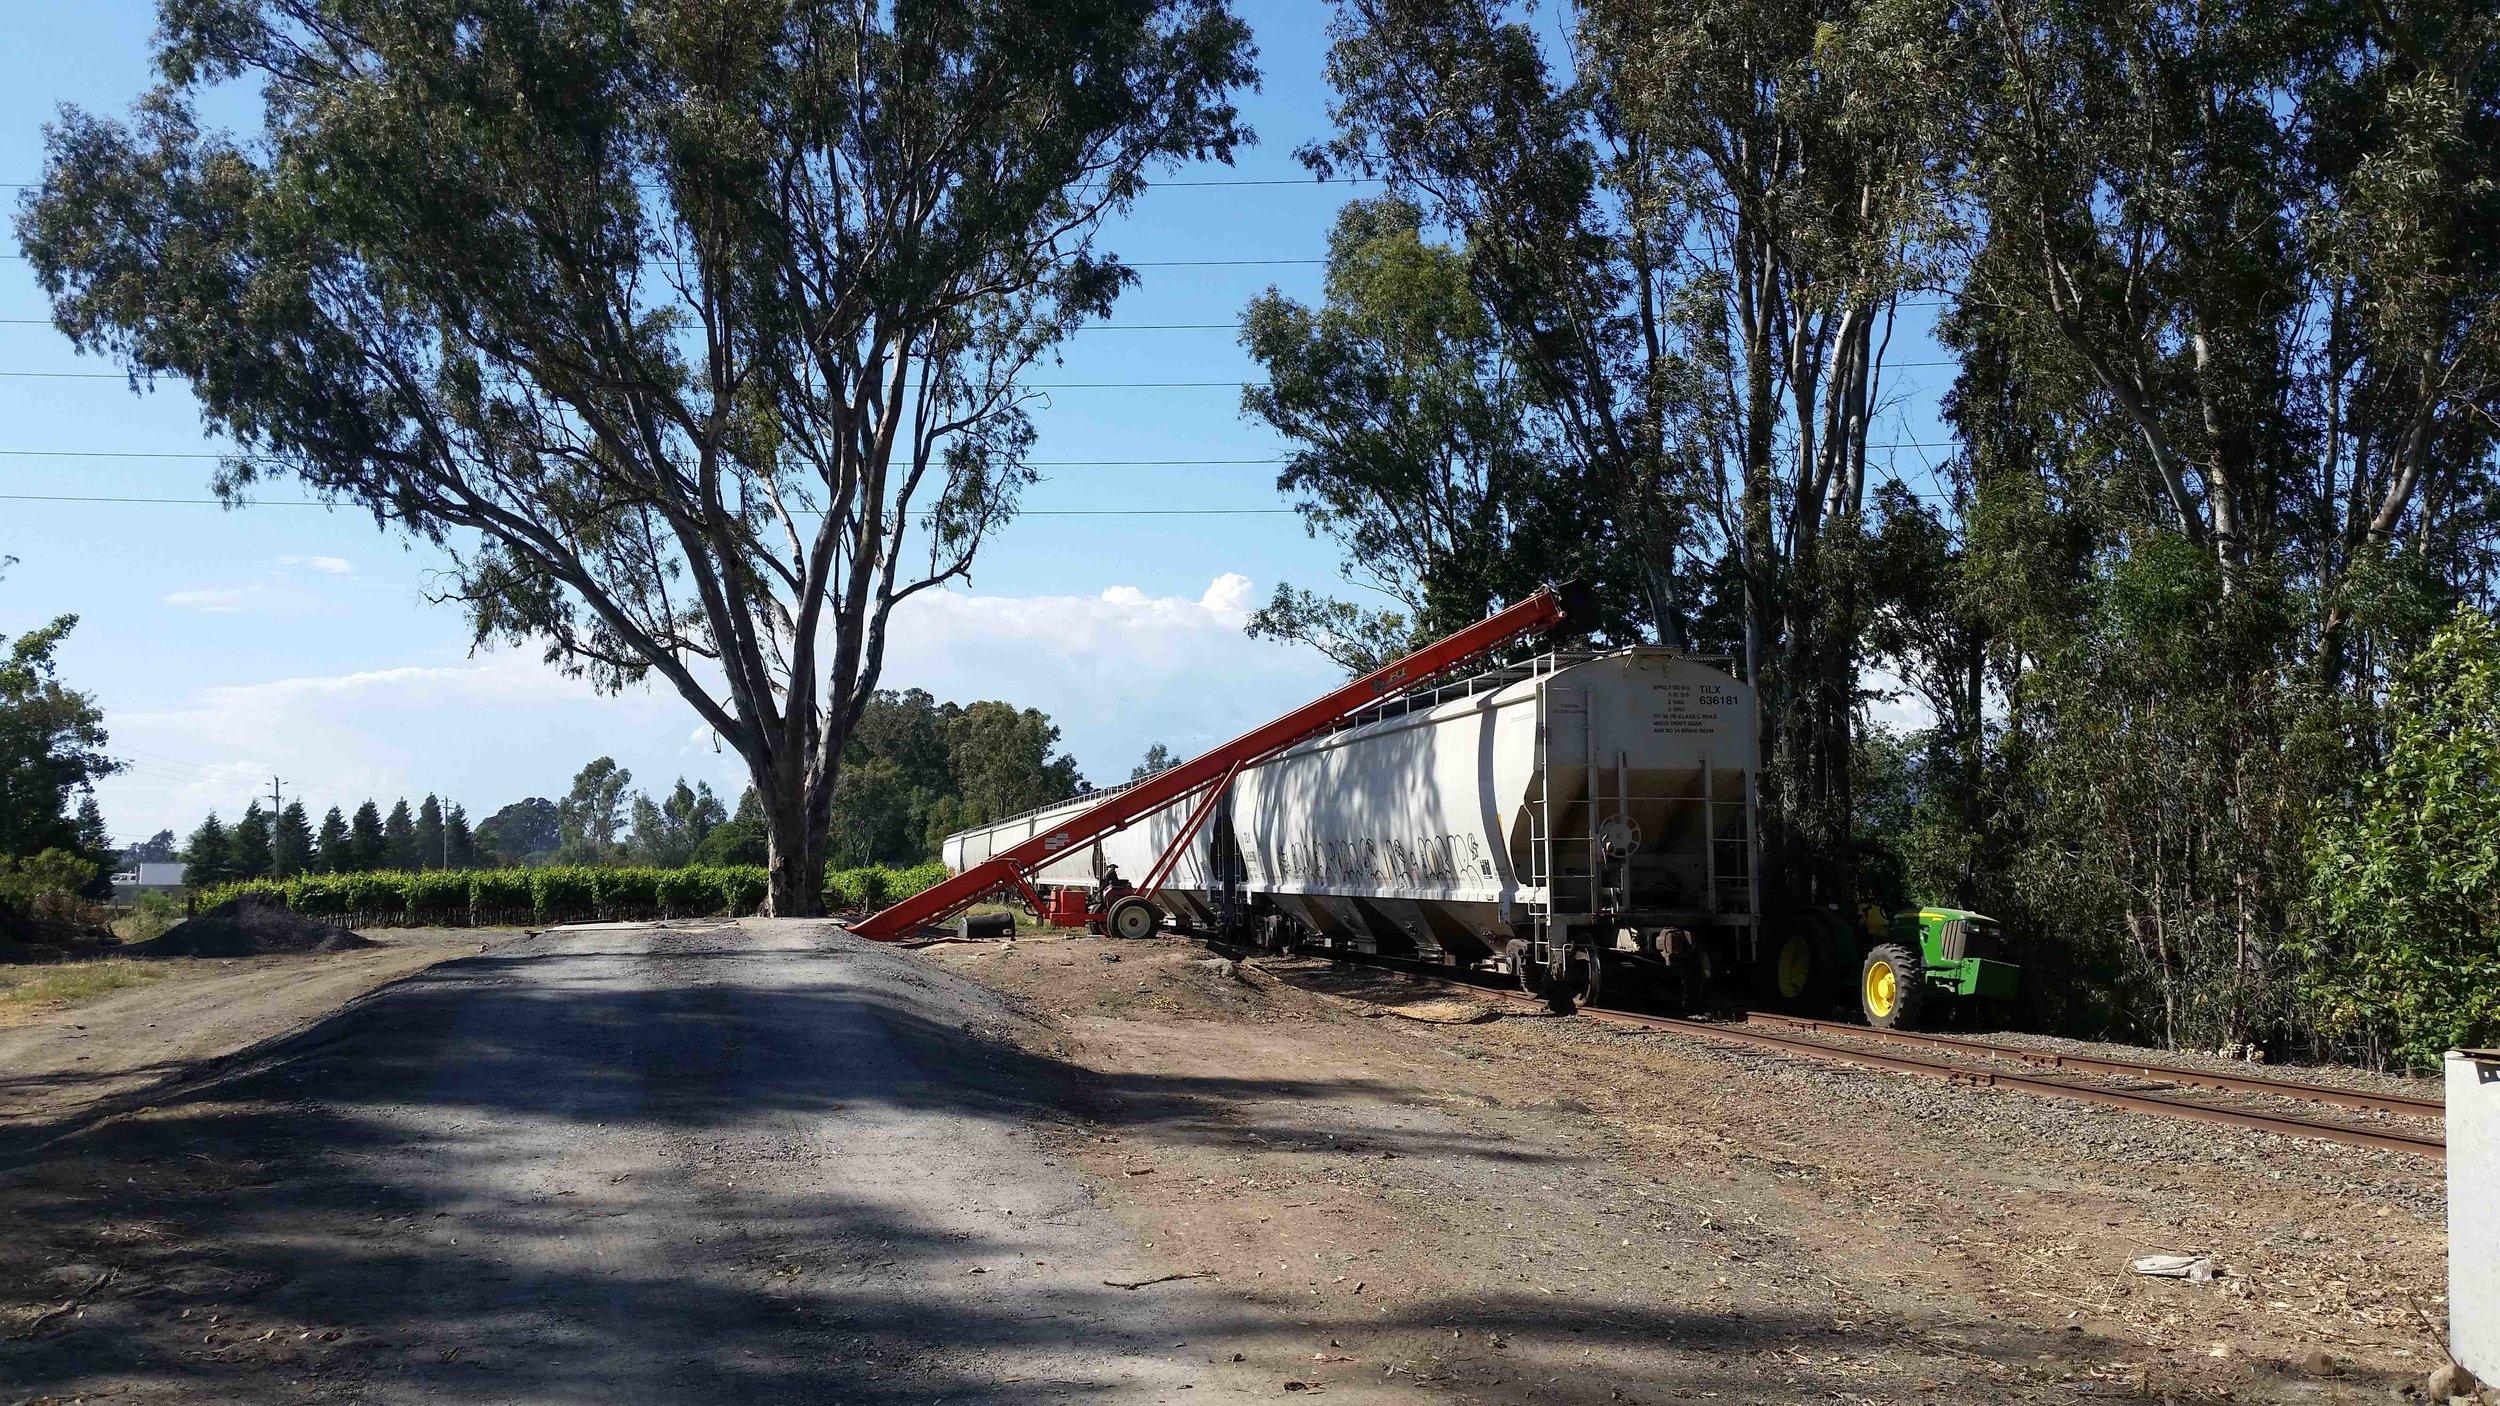 Grain Transloading - We offer grain transloading options in partnership with Poz Trading of Petaluma. Available transload sites include Schellville, Petaluma, and Windsor.